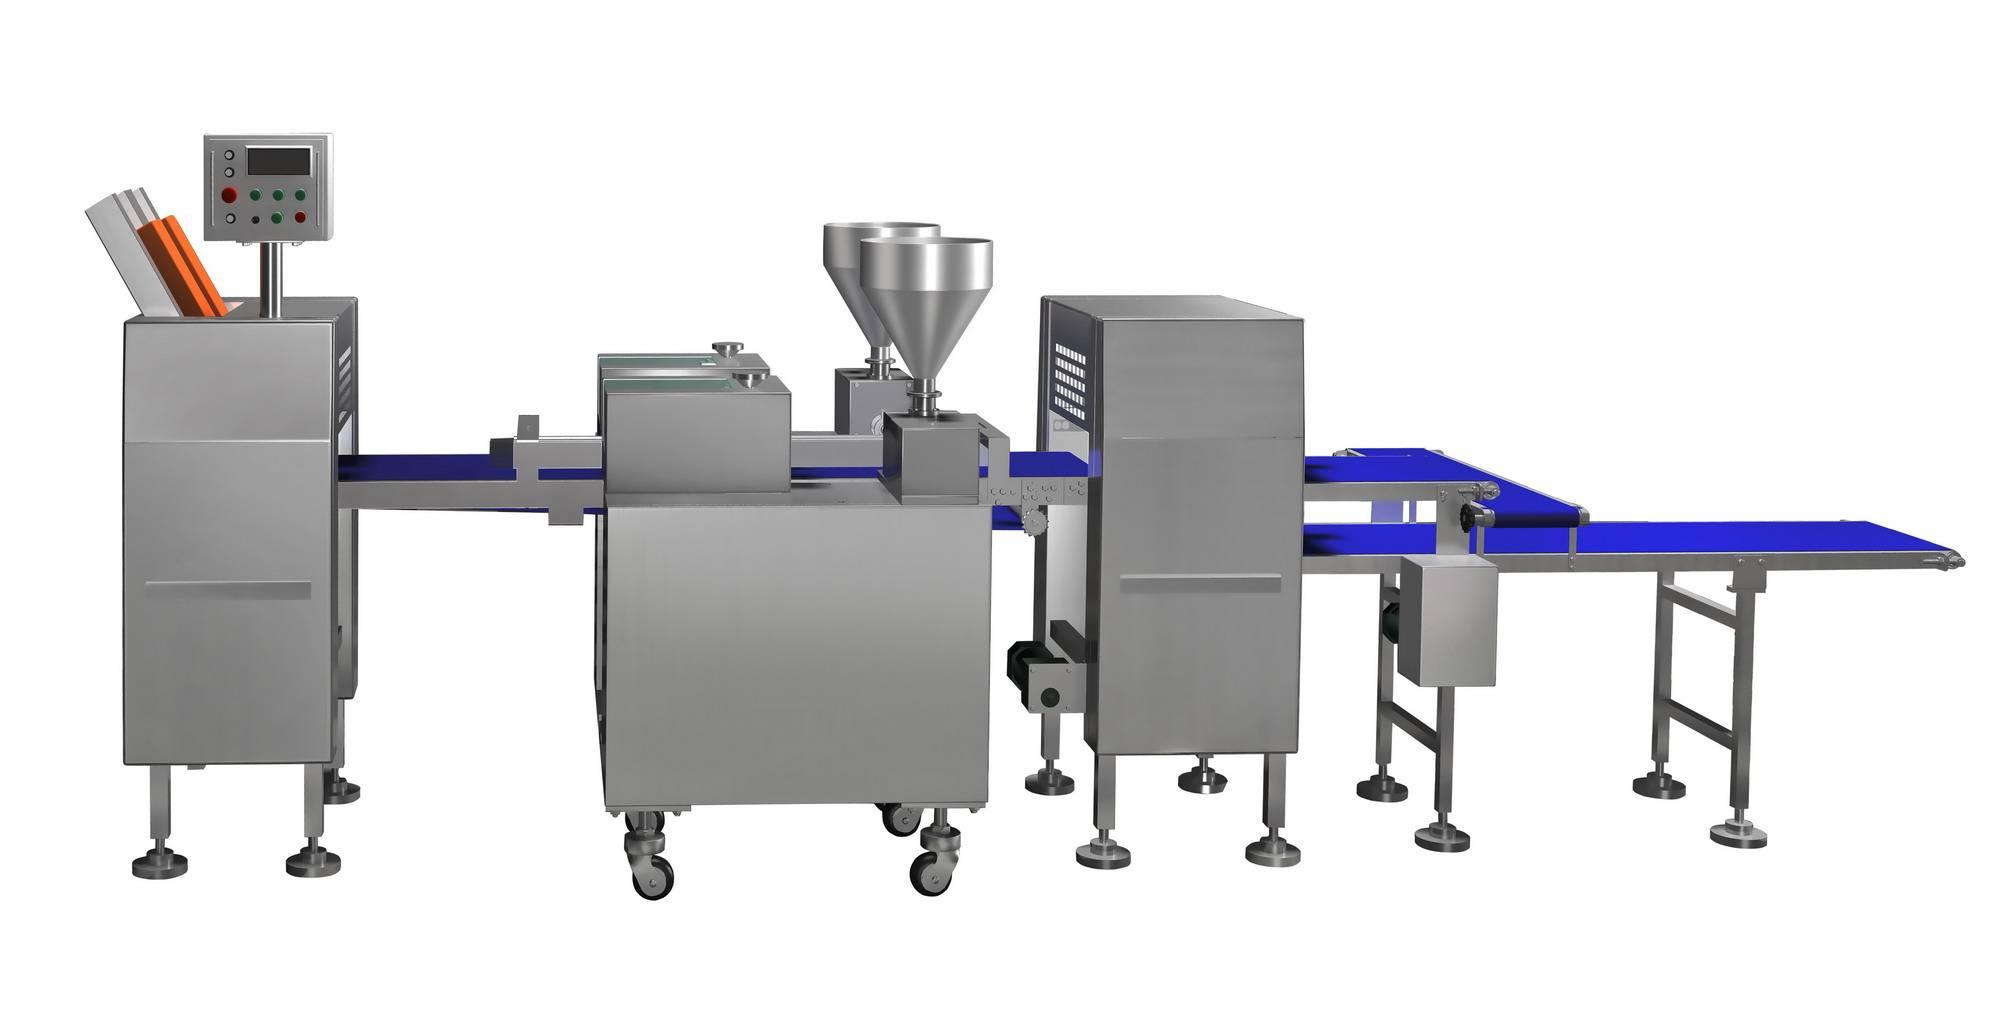 Pita/Pocket bread forming machine